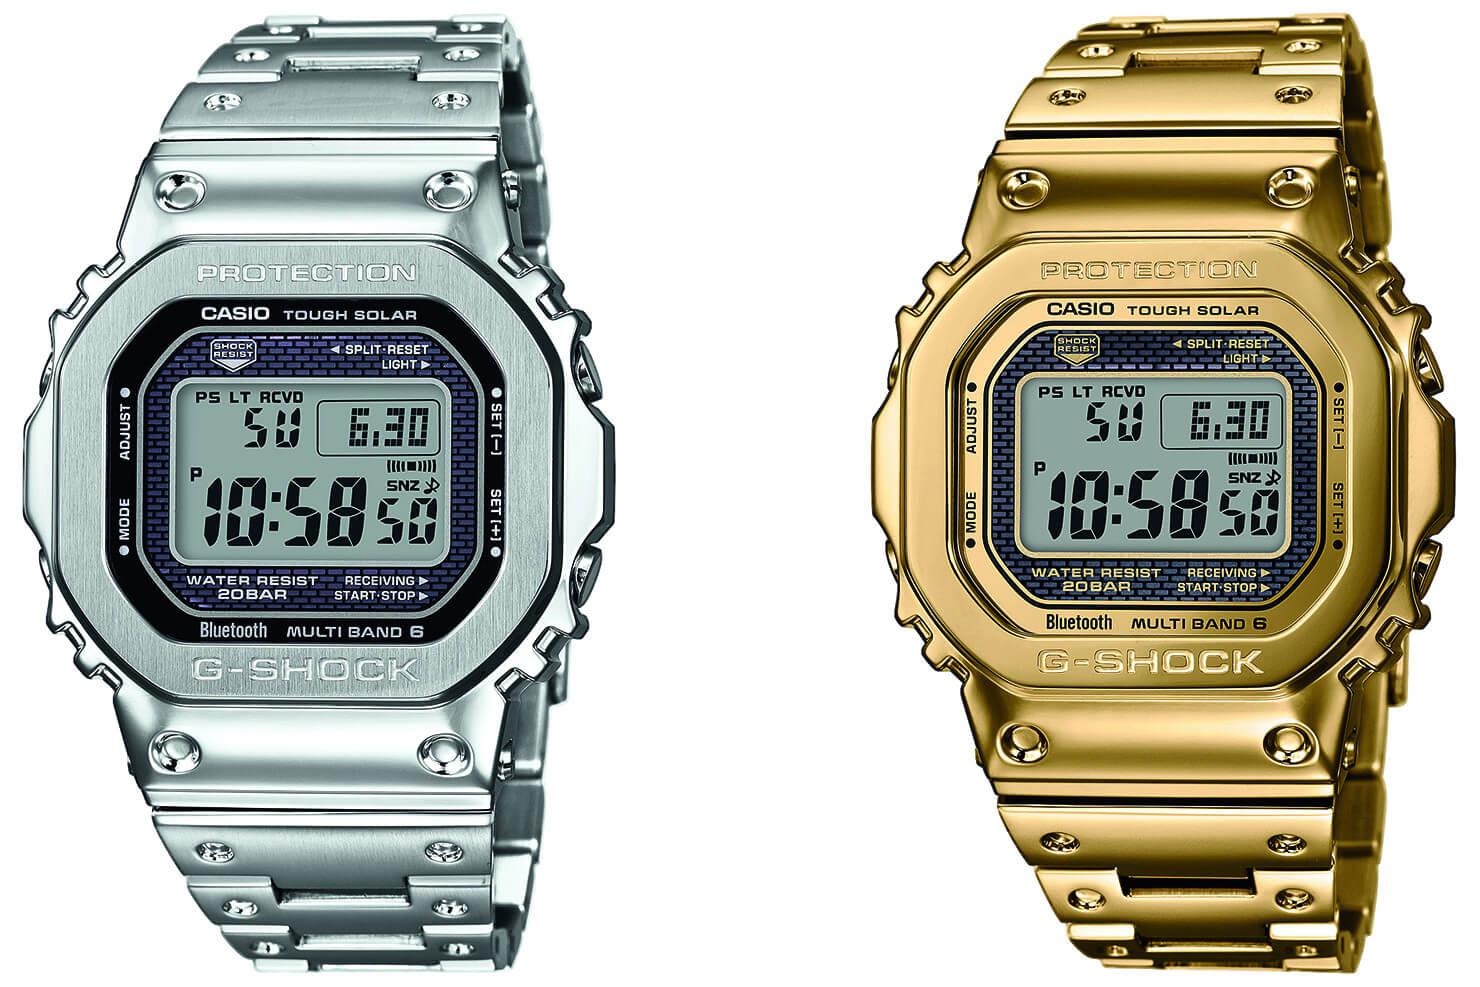 90d357f5727c Full-Metal G-Shock GMW-B5000  GMW-B5000D-1   GMW-B5000TFG-9 ...